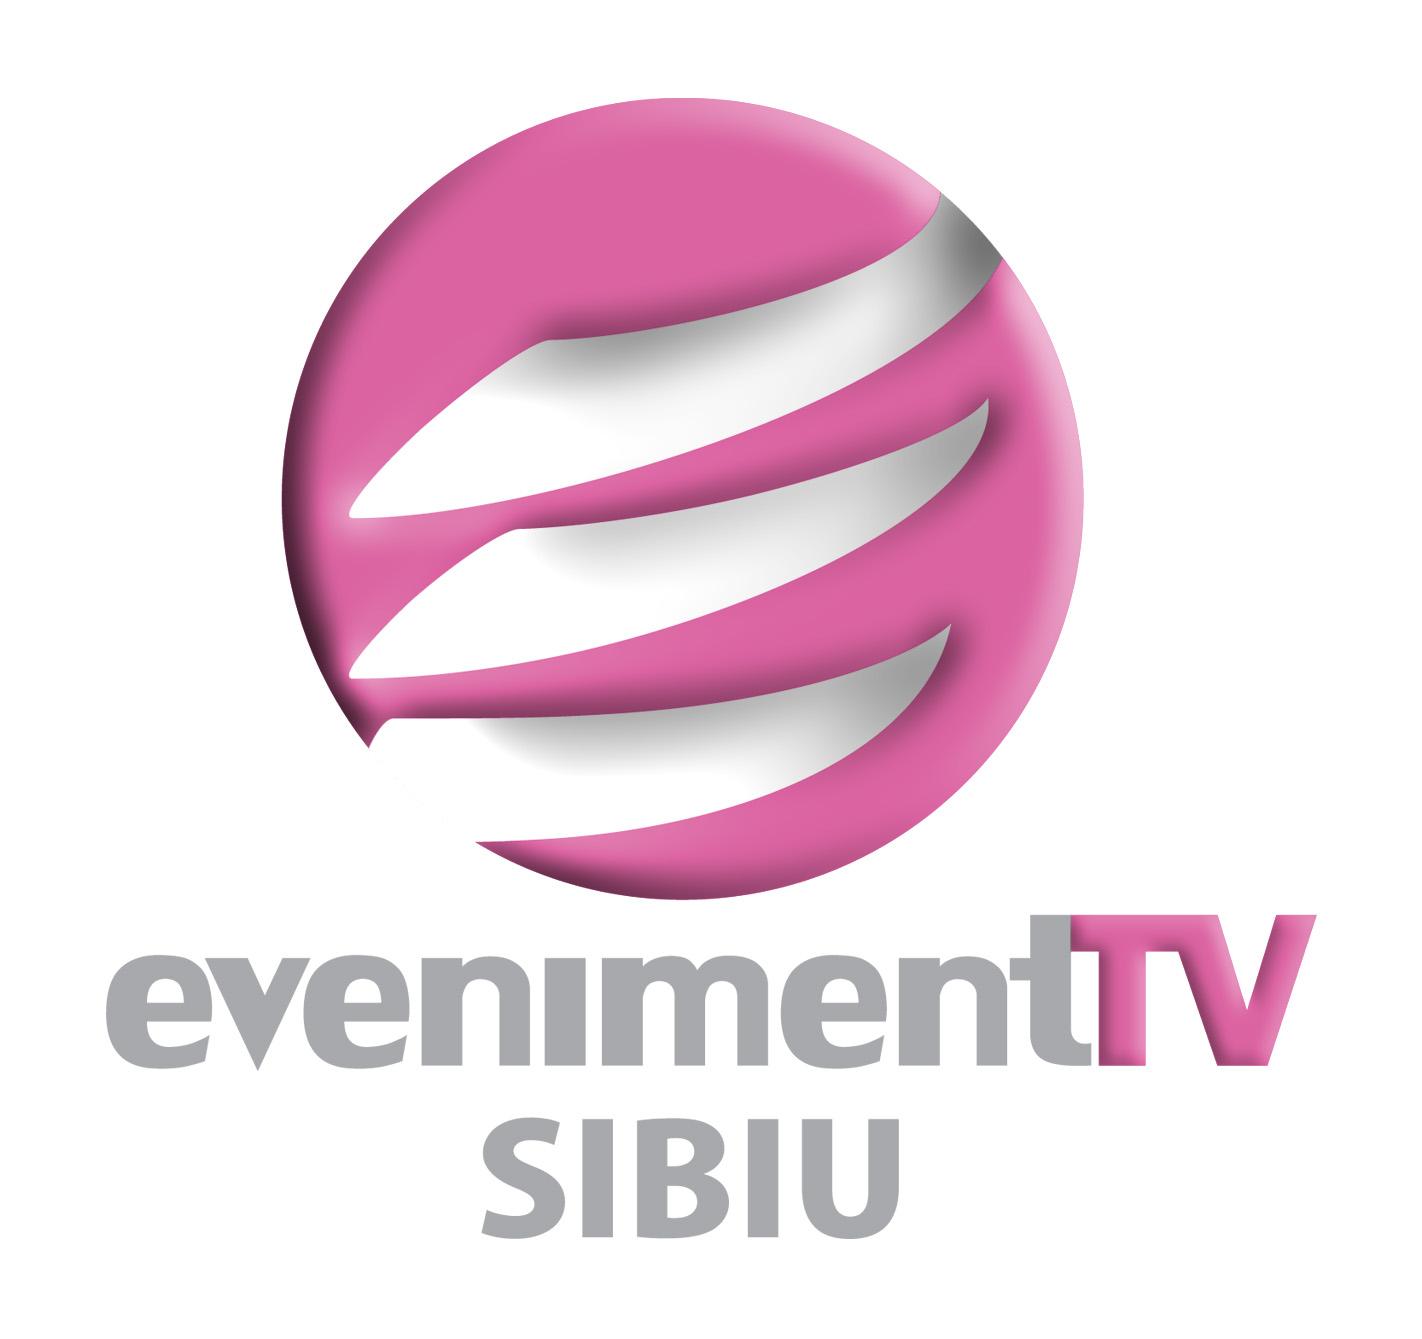 Eveniment TV SIBIU-Disponibil in grila NEXTGEN si MANSAT